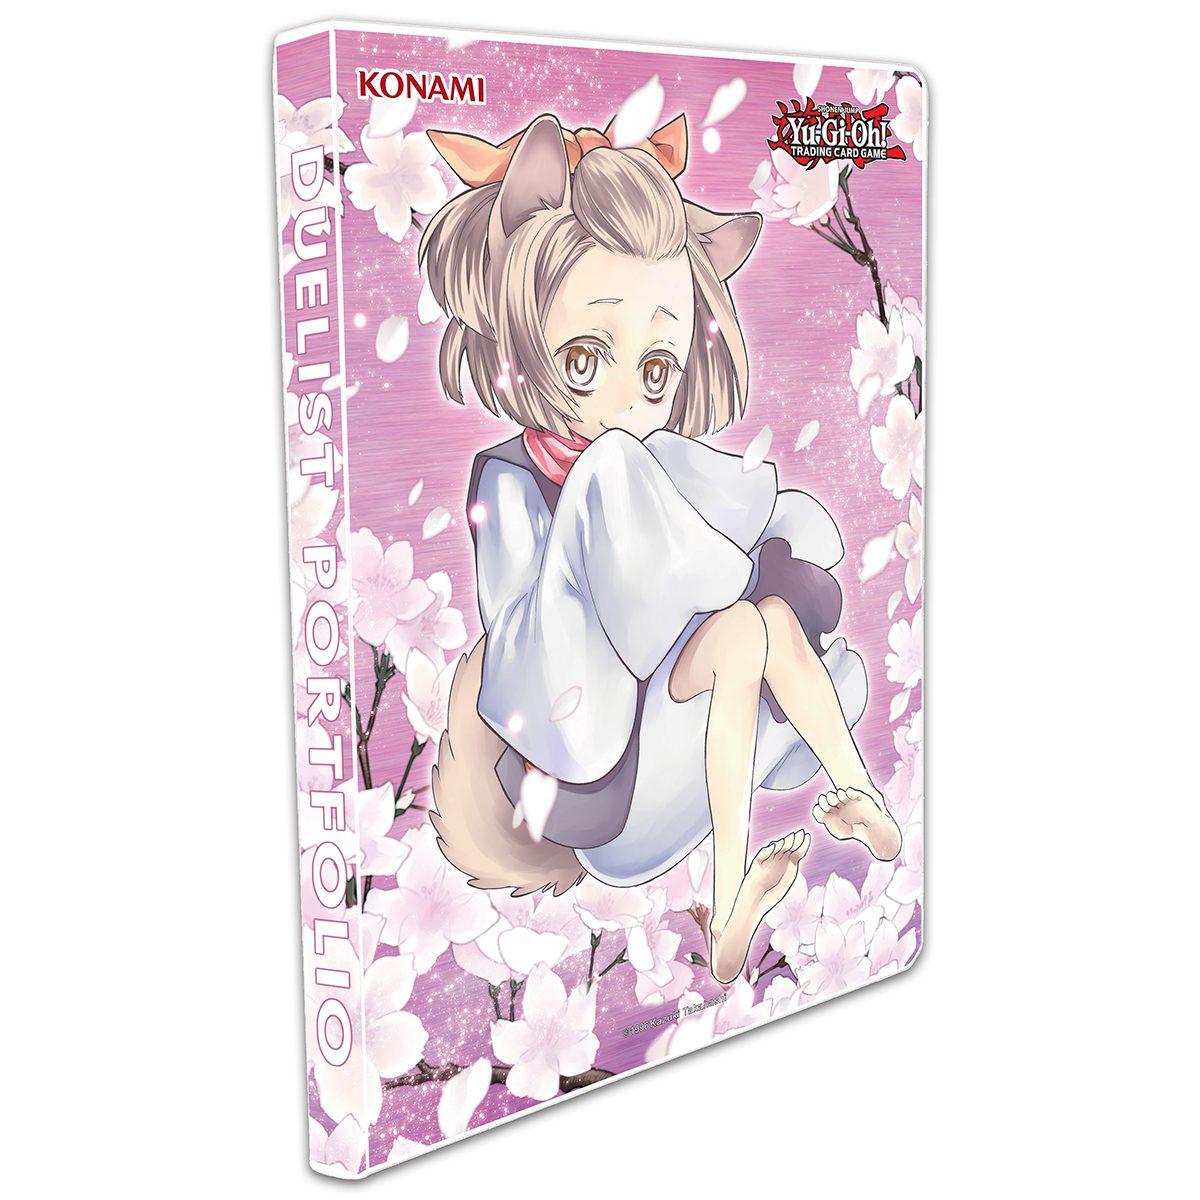 Album Yugioh Ash Blossom 9 Pocket Portfolio Konami